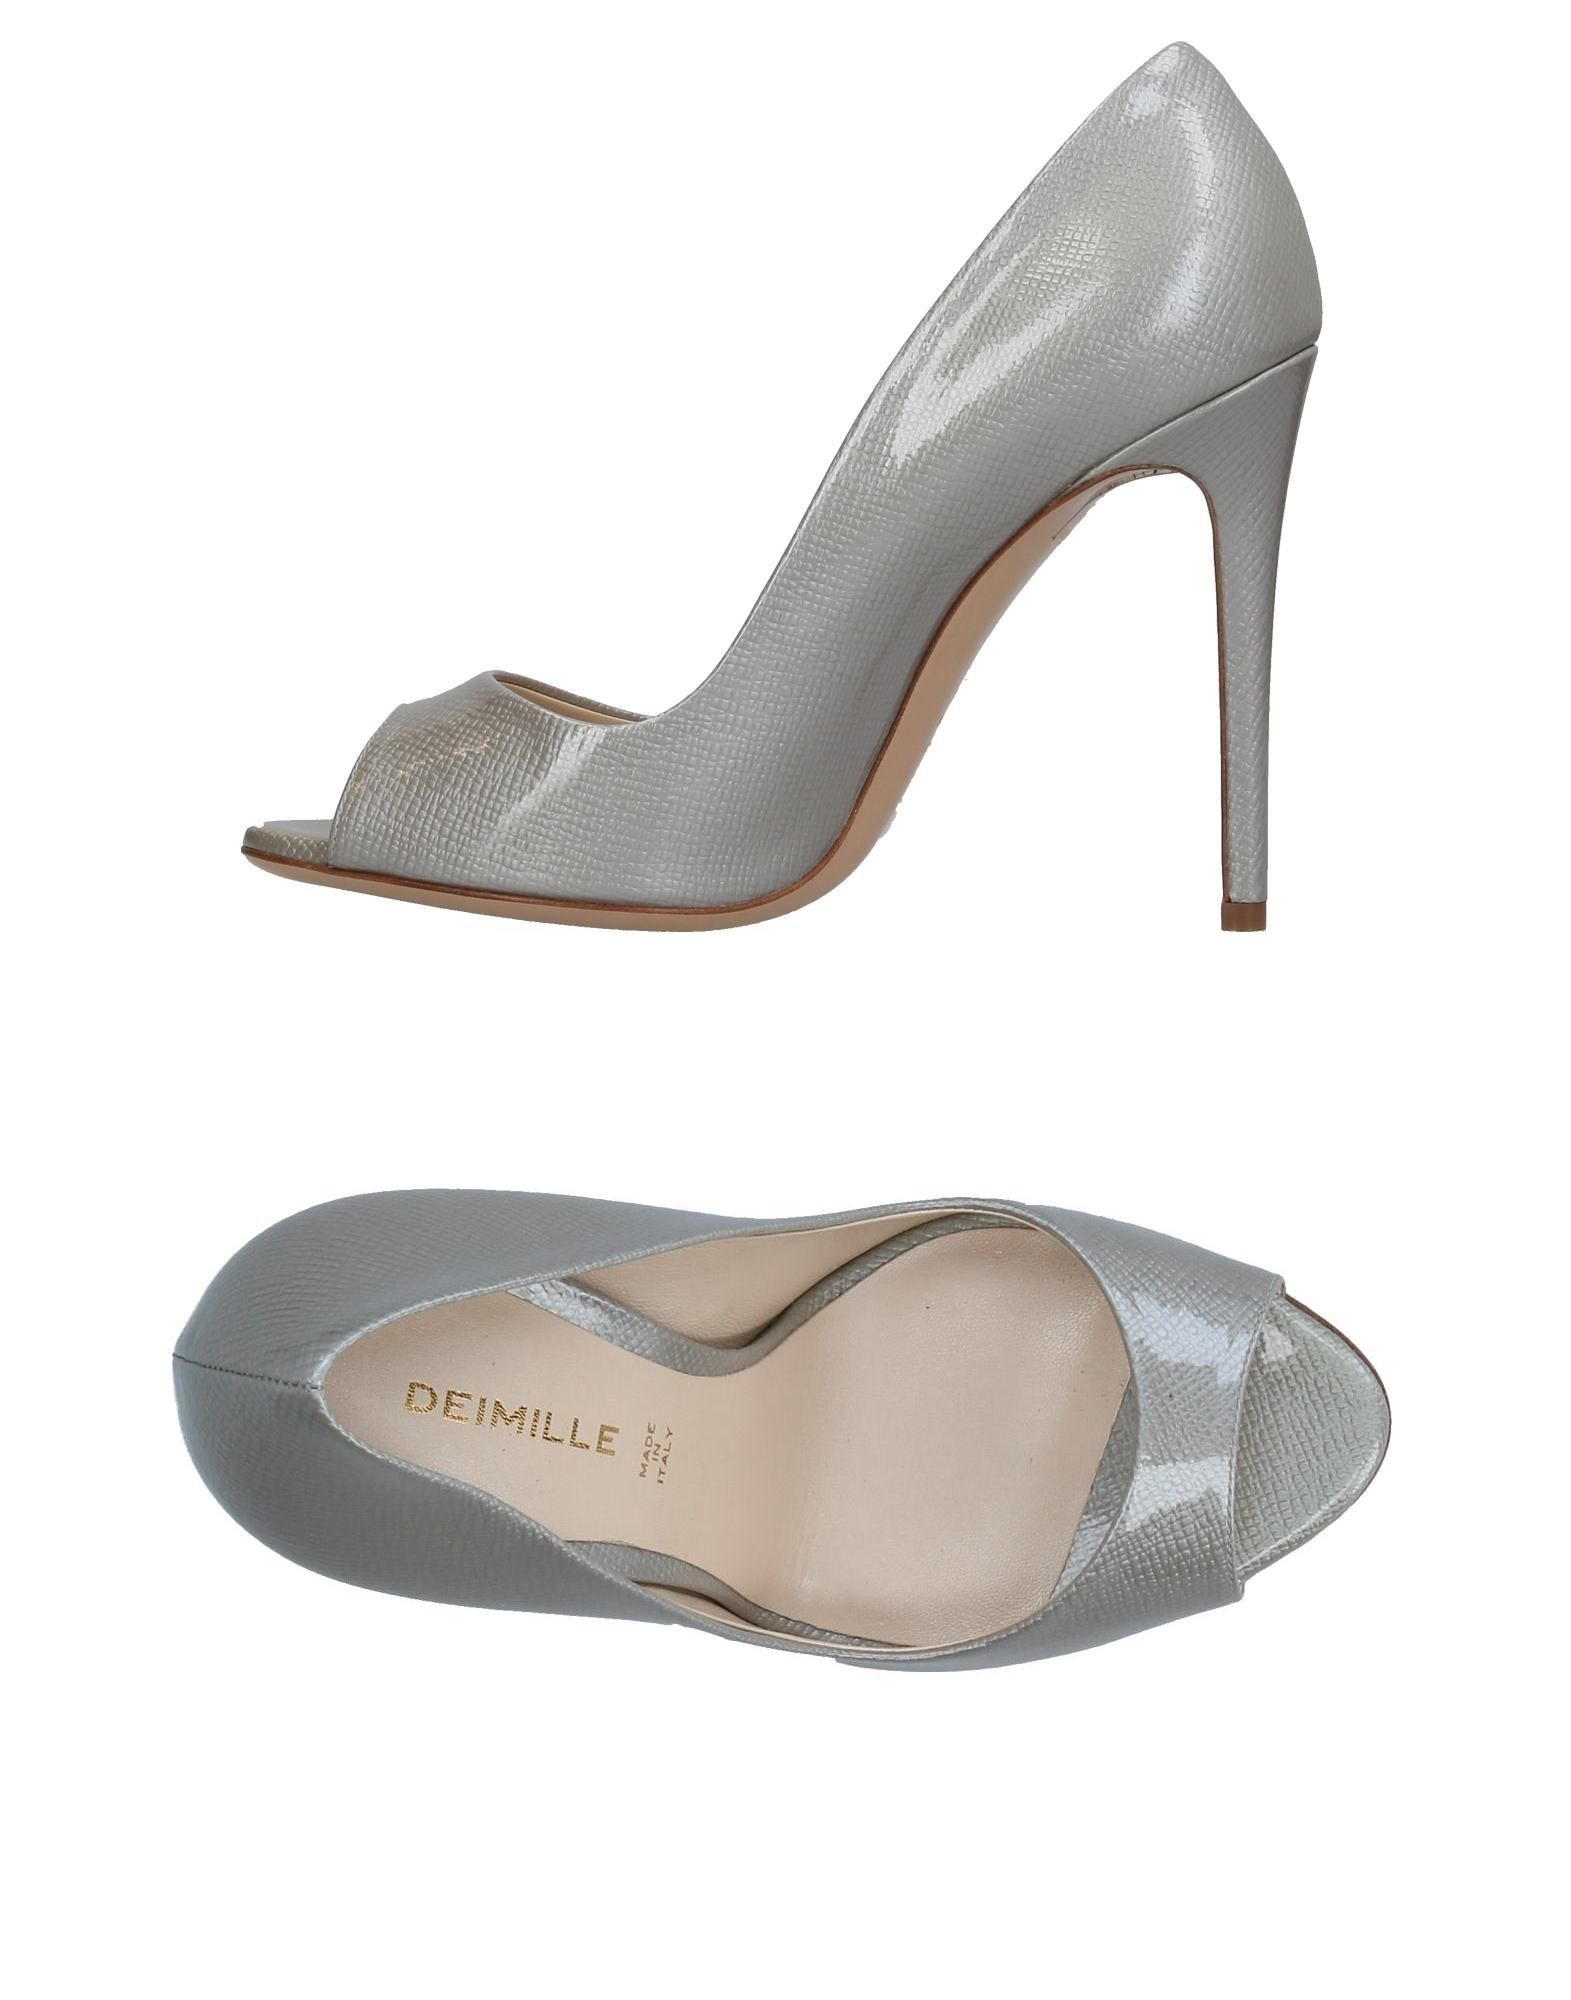 Deimille Pumps Damen  11358098GA Gute Qualität beliebte Schuhe